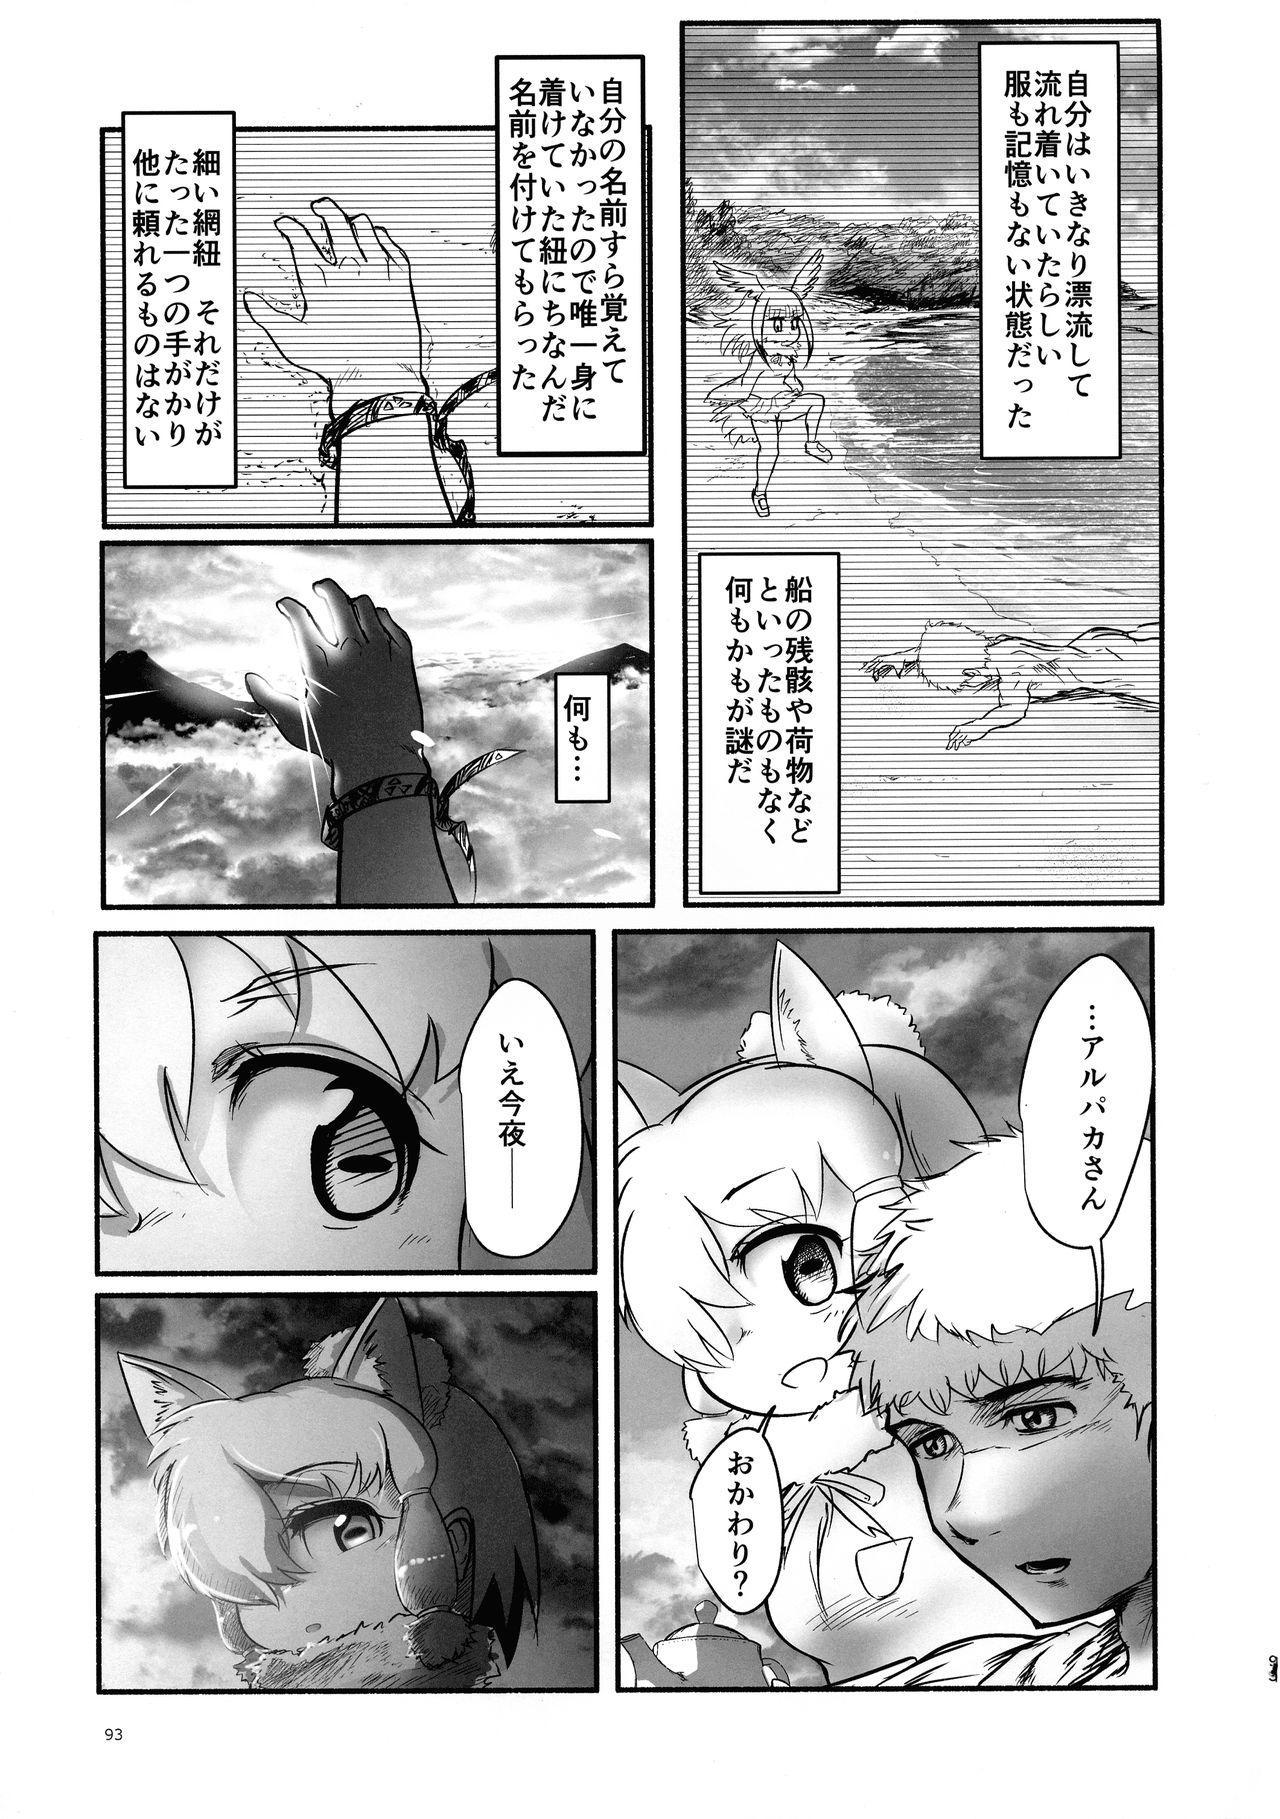 Fuwaaa! Irasshaai! Ura Iyashi no Alpaca-san Goudou 92